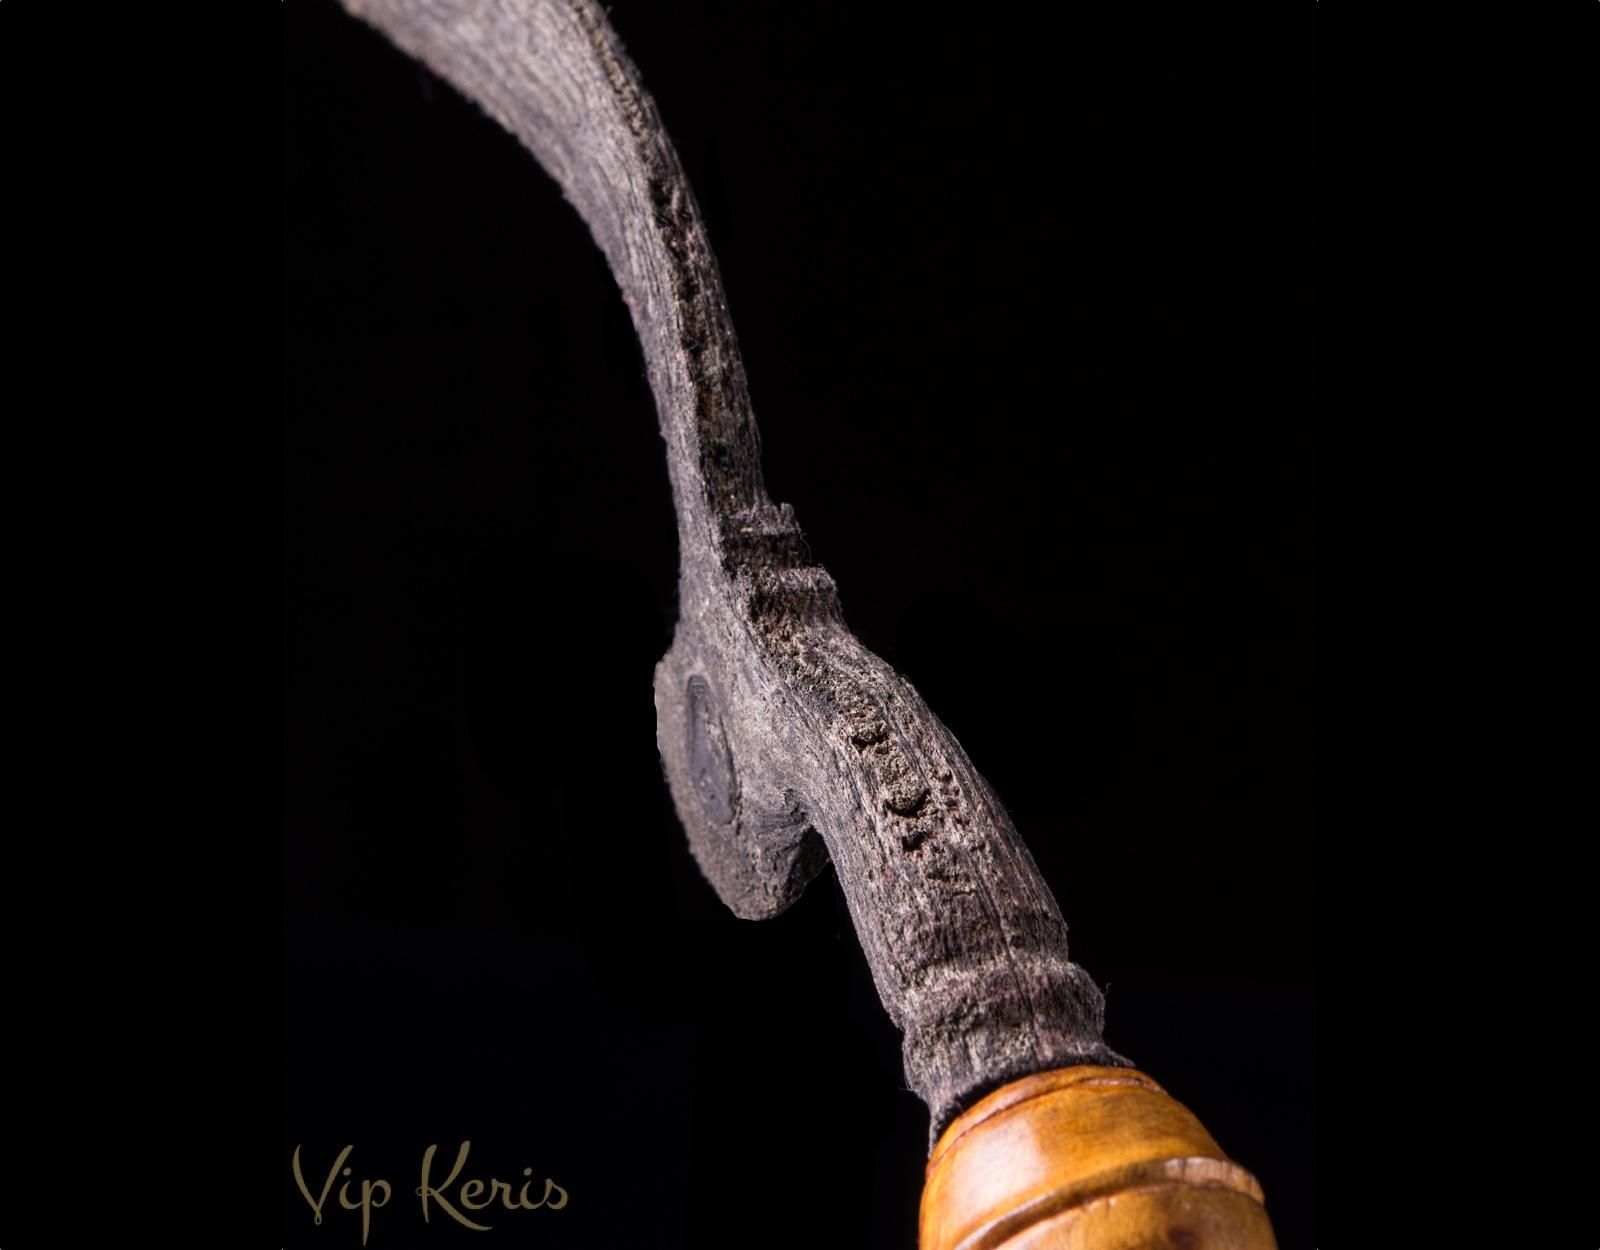 Kujang Lanang фото VipKeris